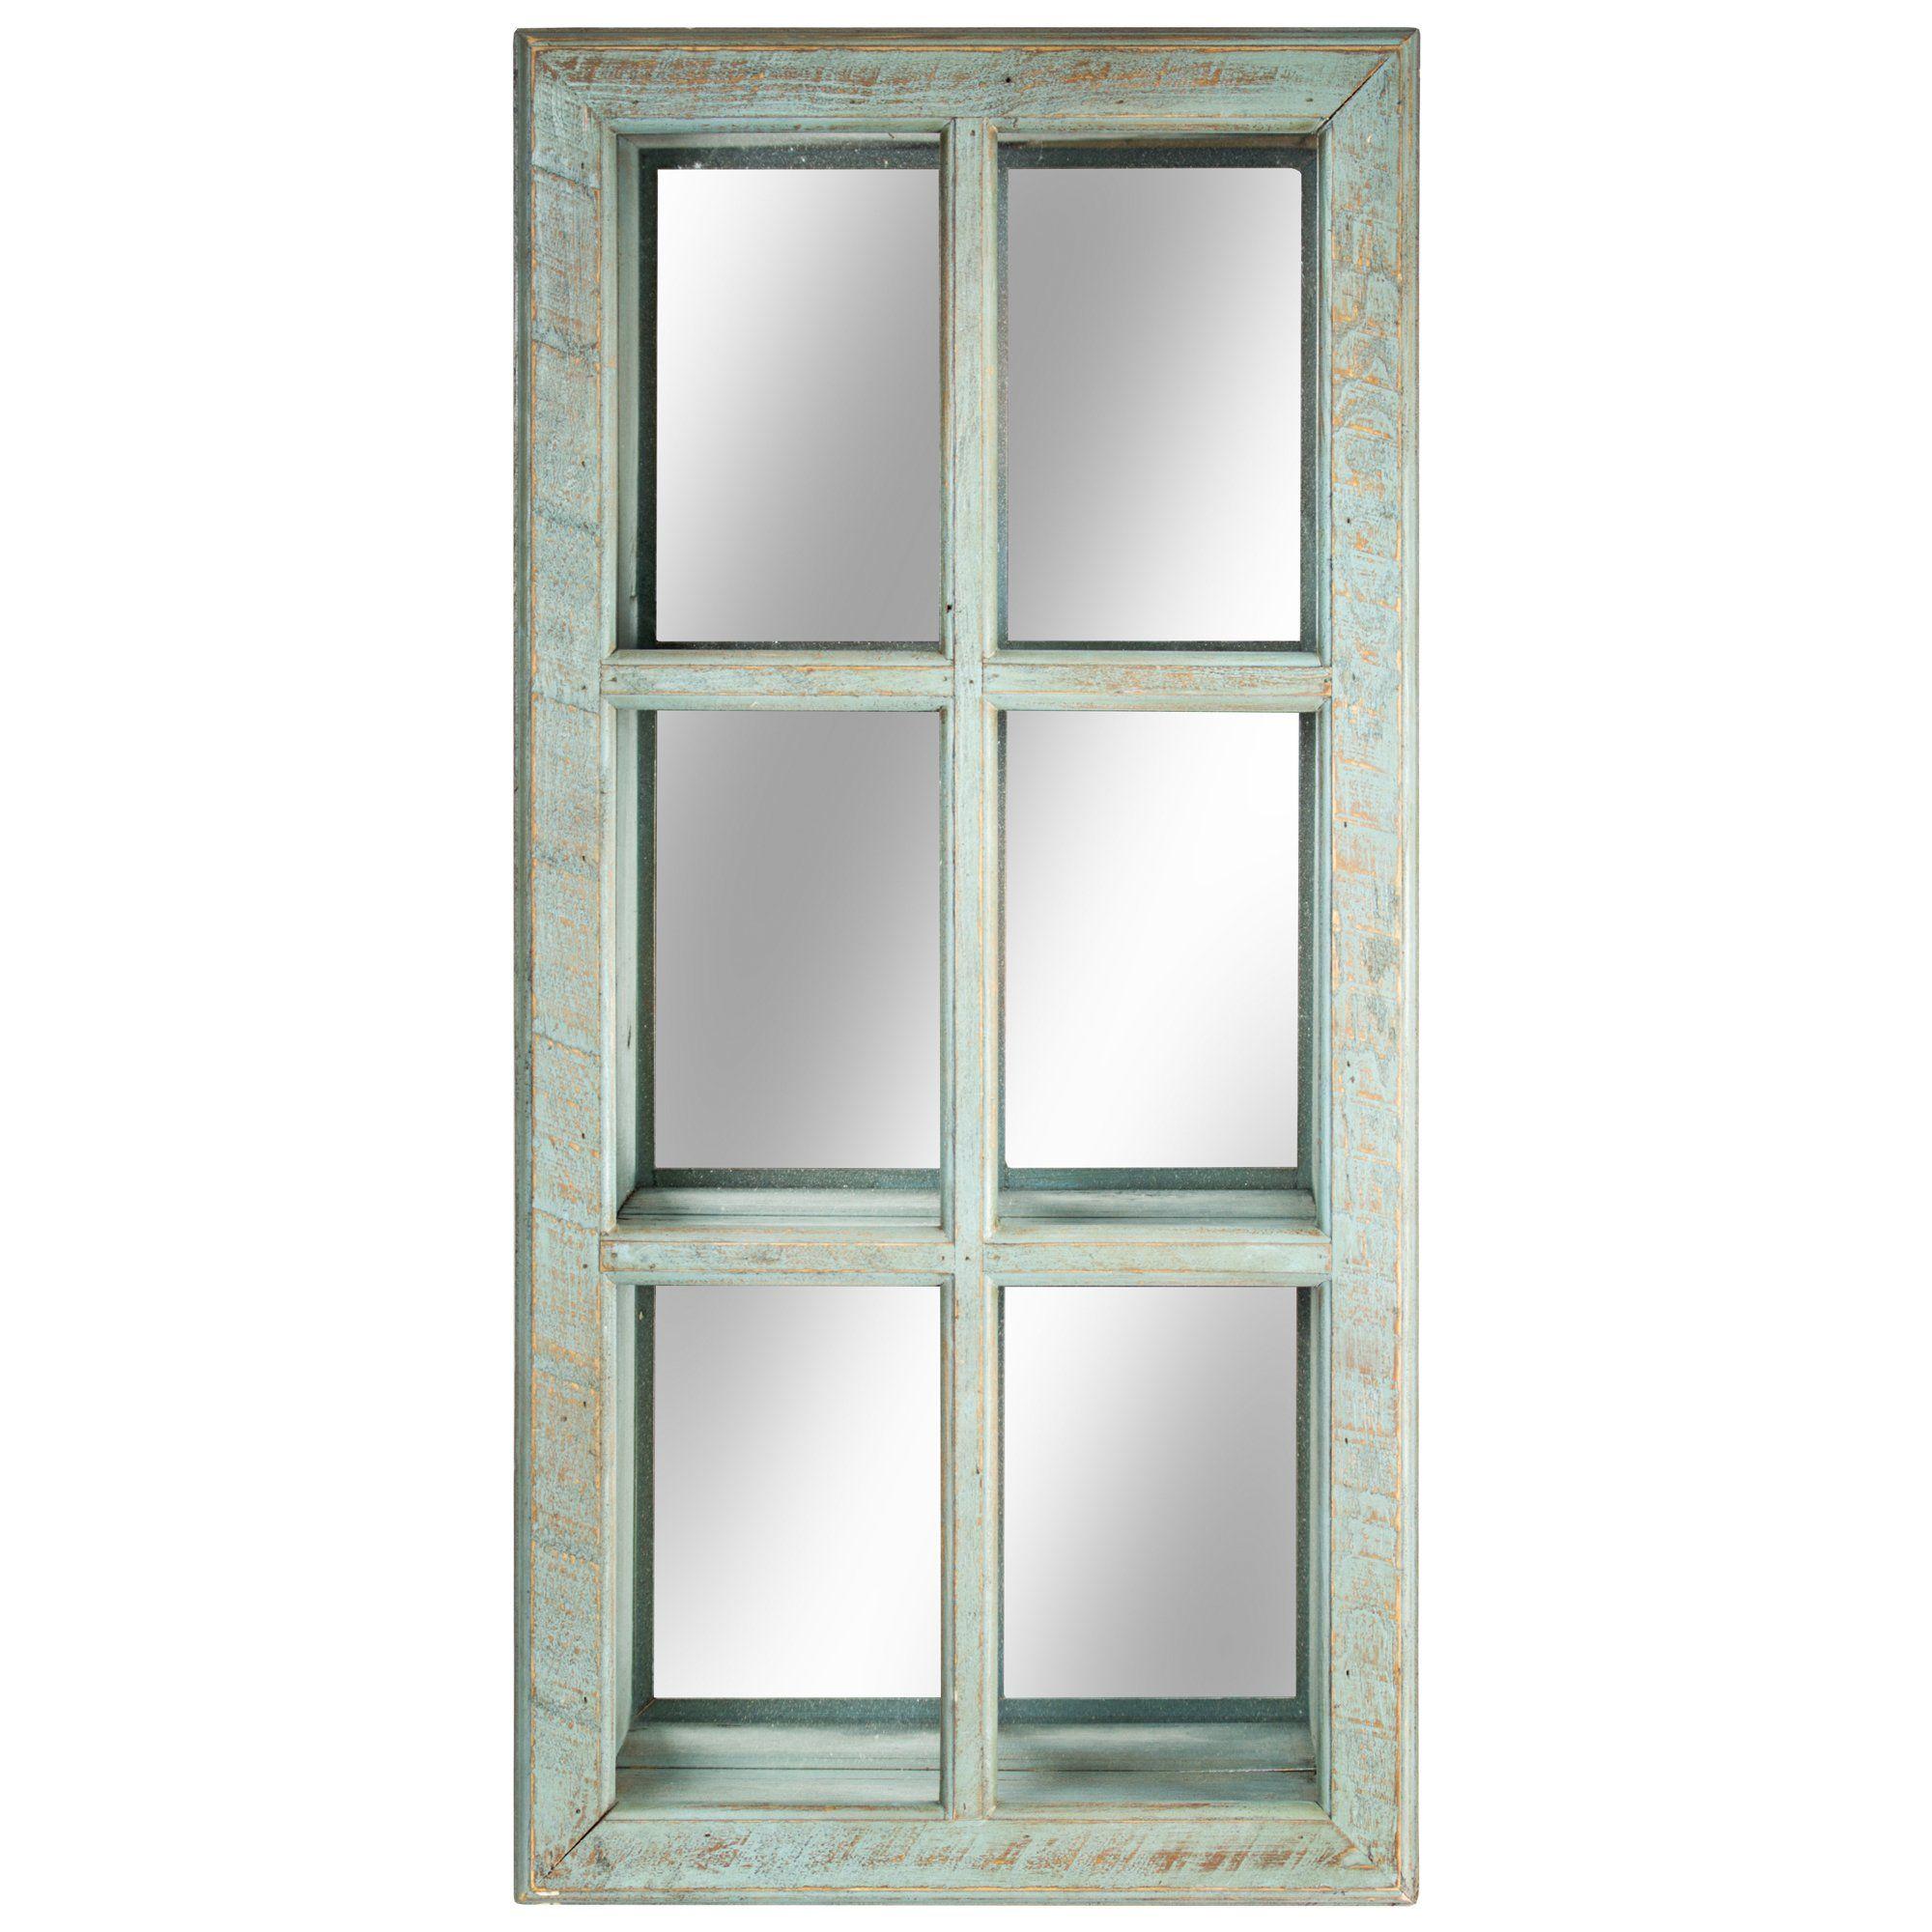 Crystal Art Window Pane Vanity Wall Mirror